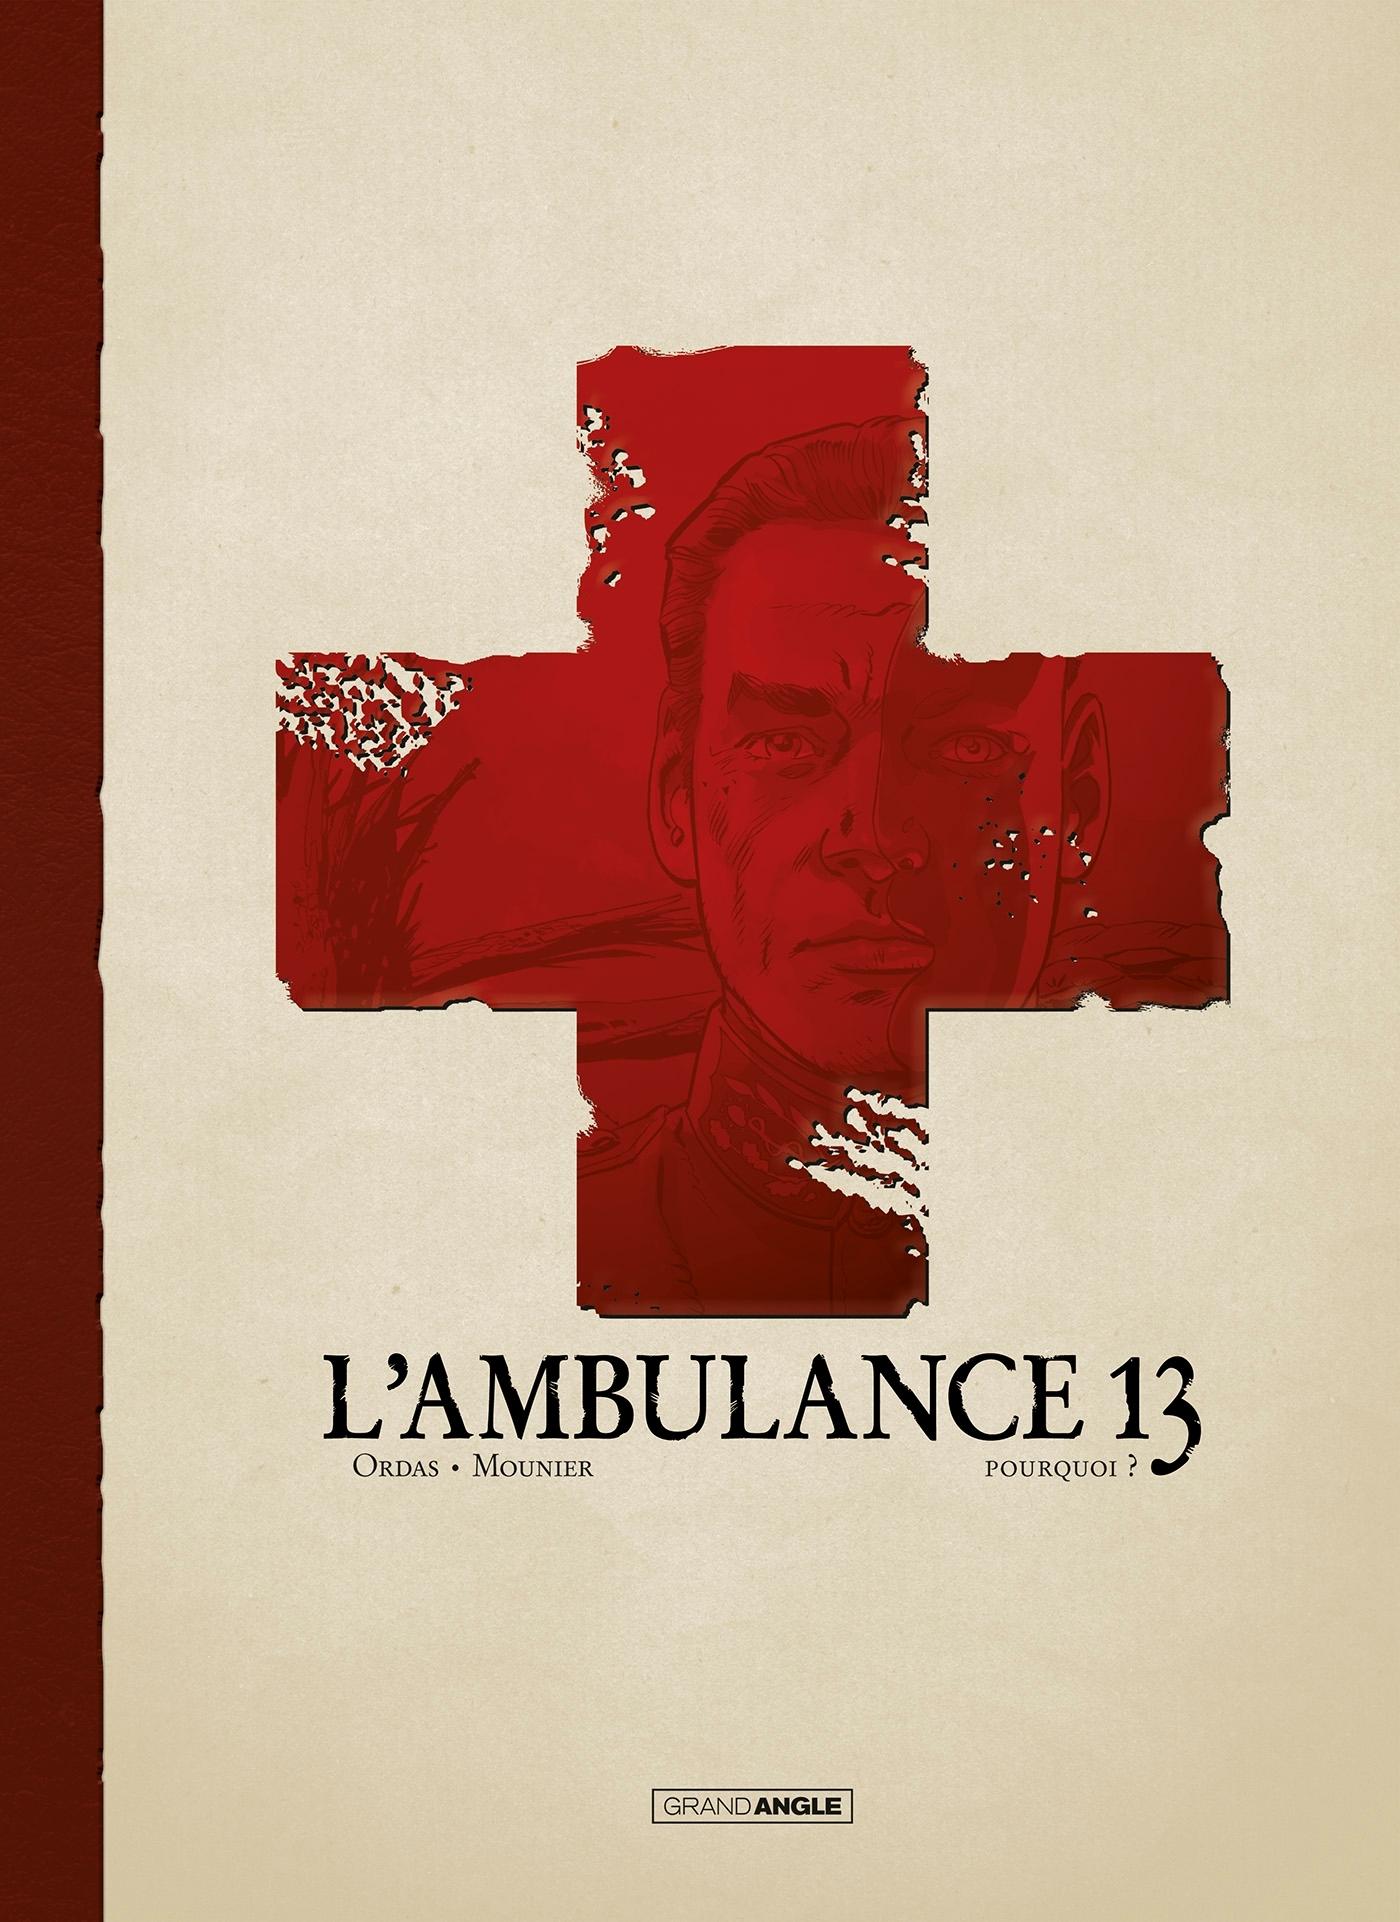 L'AMBULANCE 13 - VOL. 9 LUXE - SPECIAL CENTENAIRE